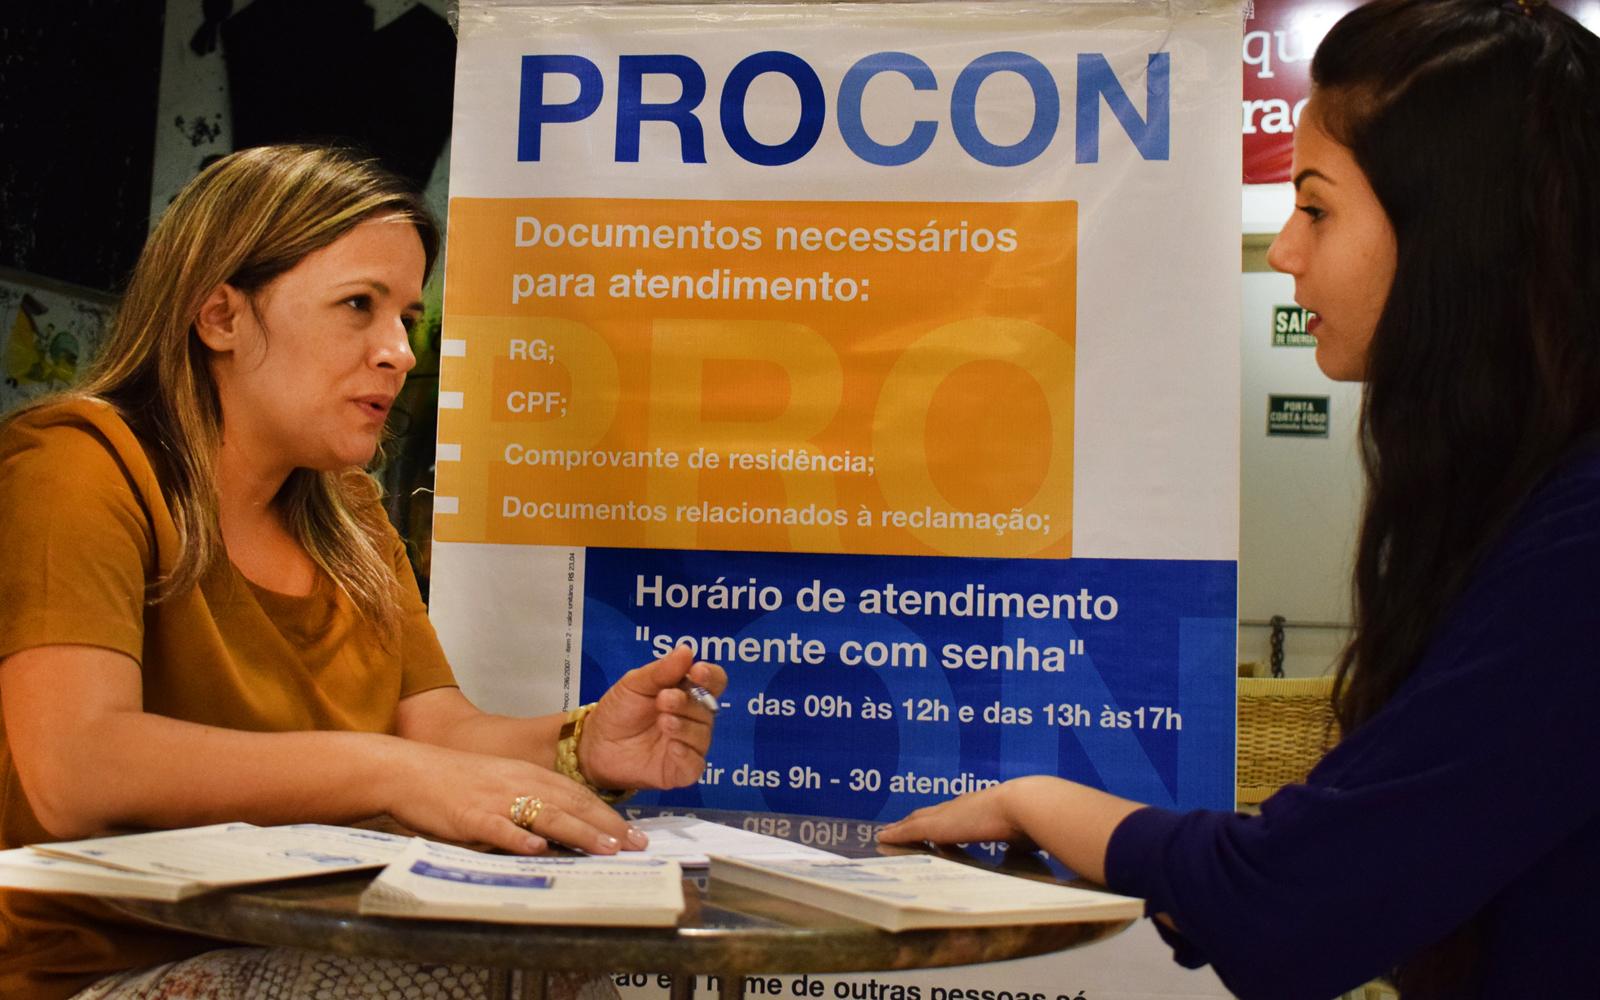 Procon SP ok